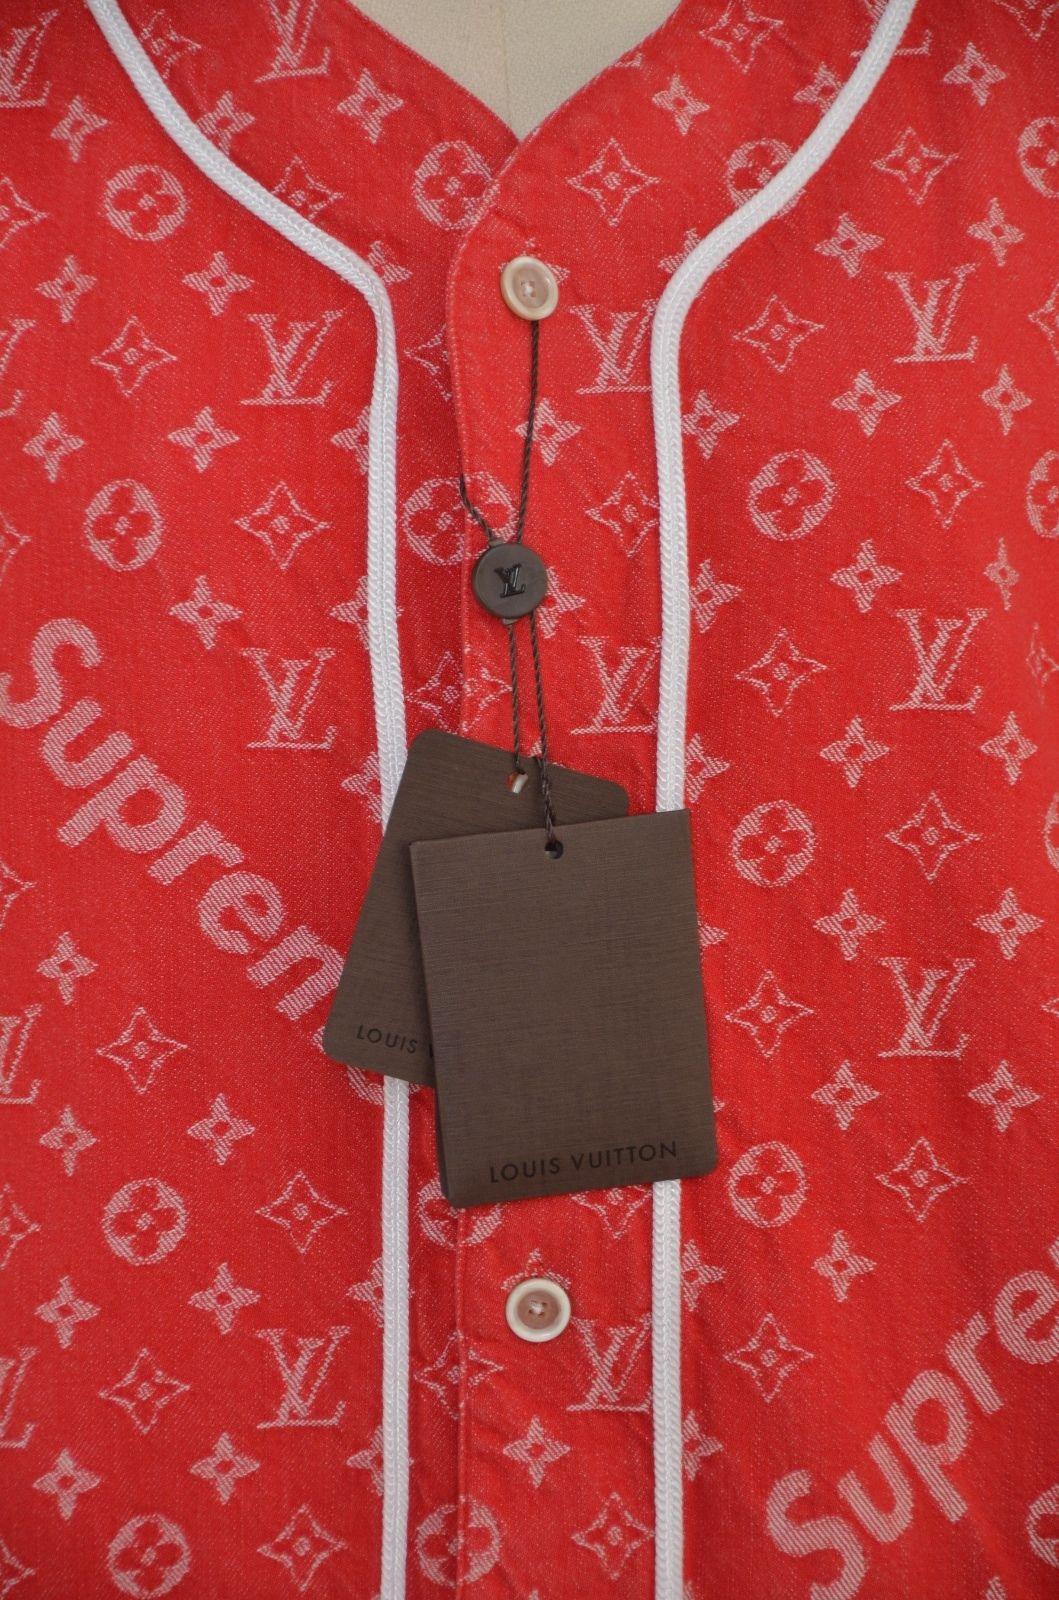 772b30d362d1cb Supreme x Louis Vuitton All Over Monogram Denim Baseball Jersey Red Sz  Medium For Sale at 1stdibs